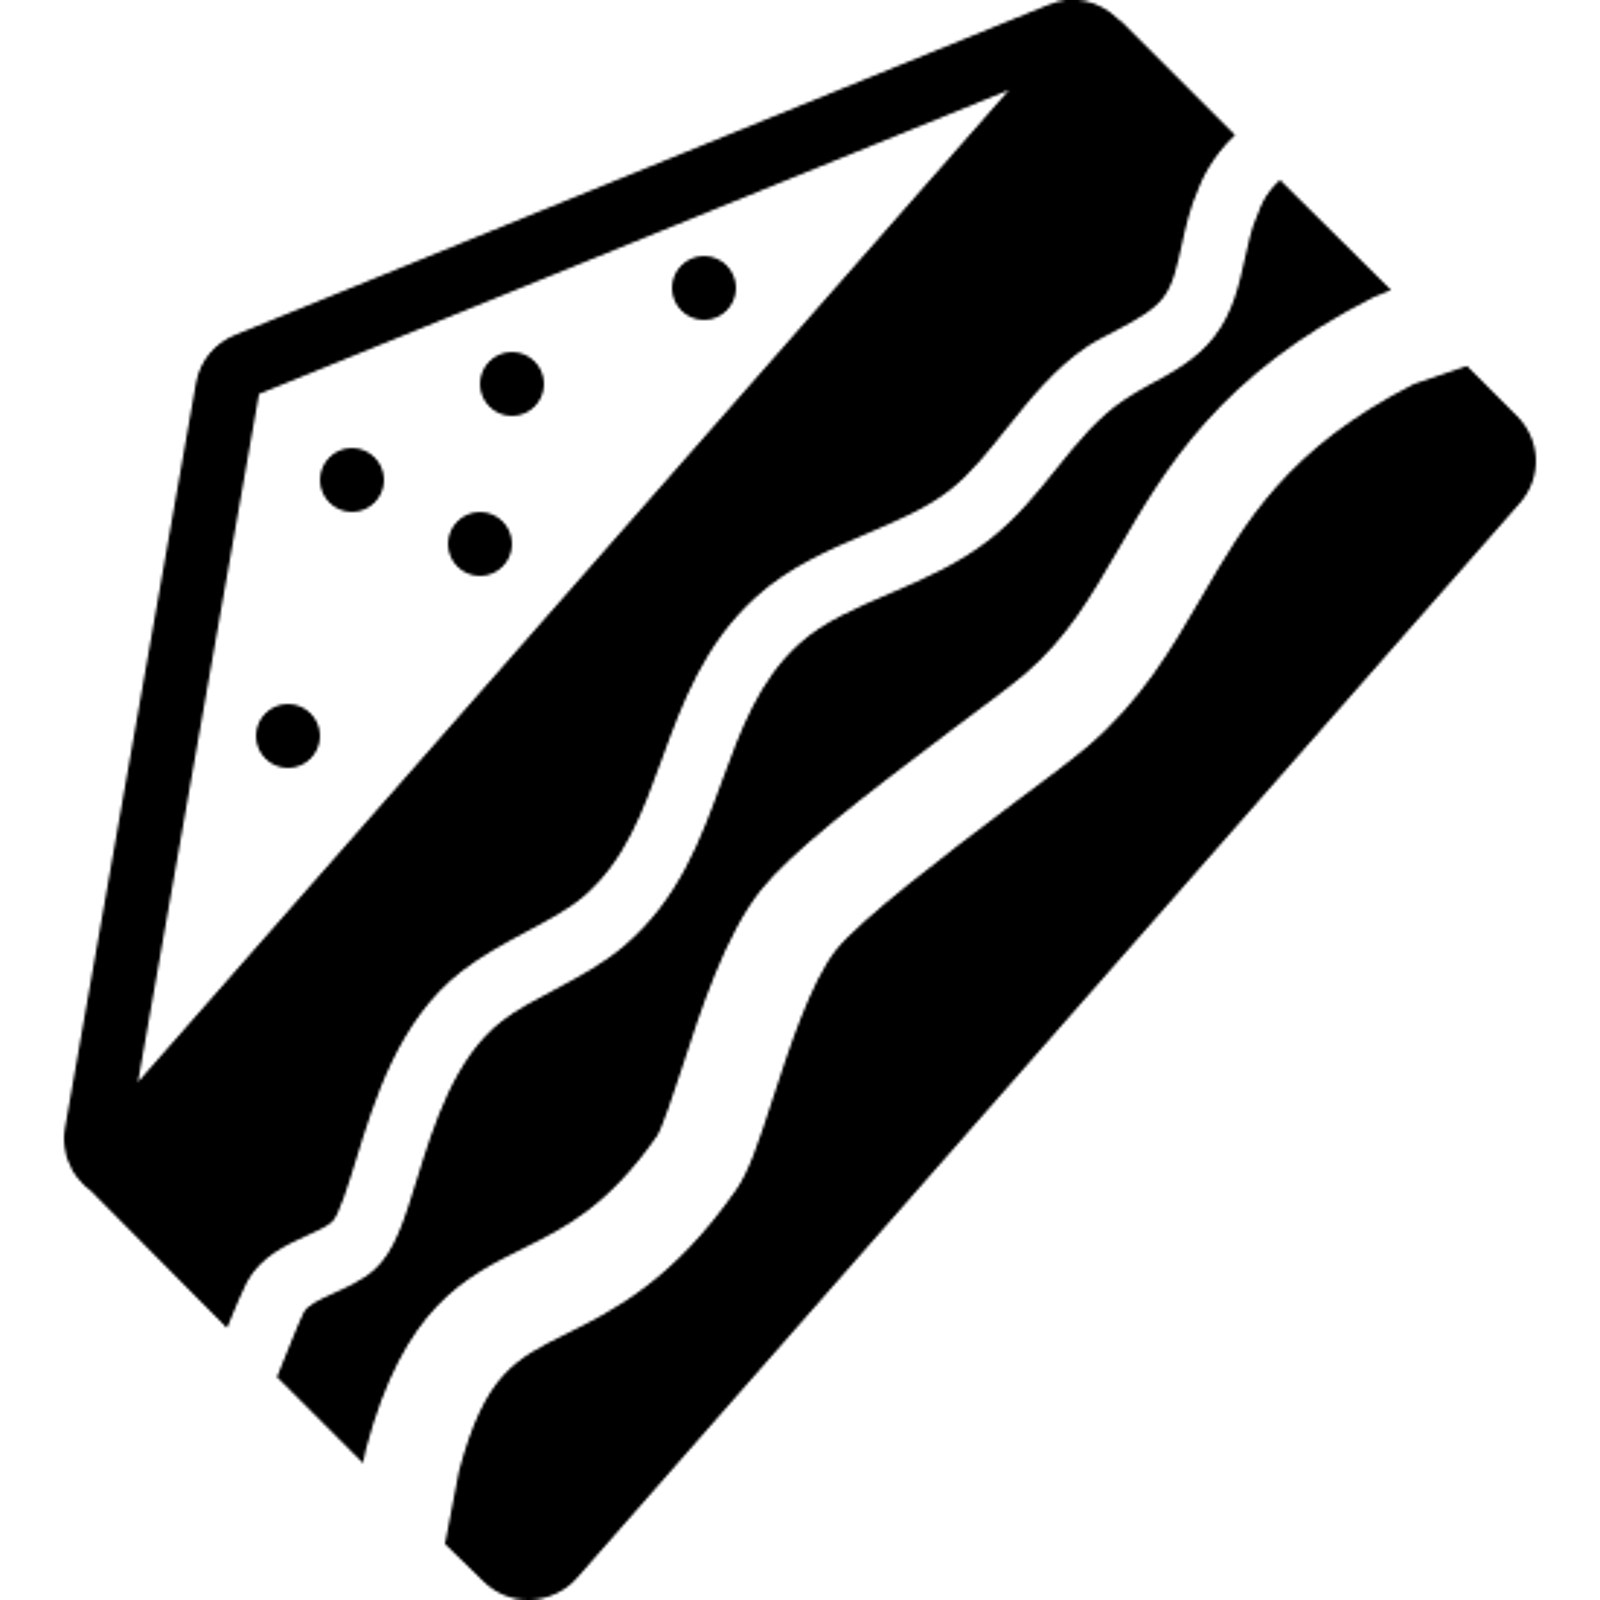 Sandwich Filled icon